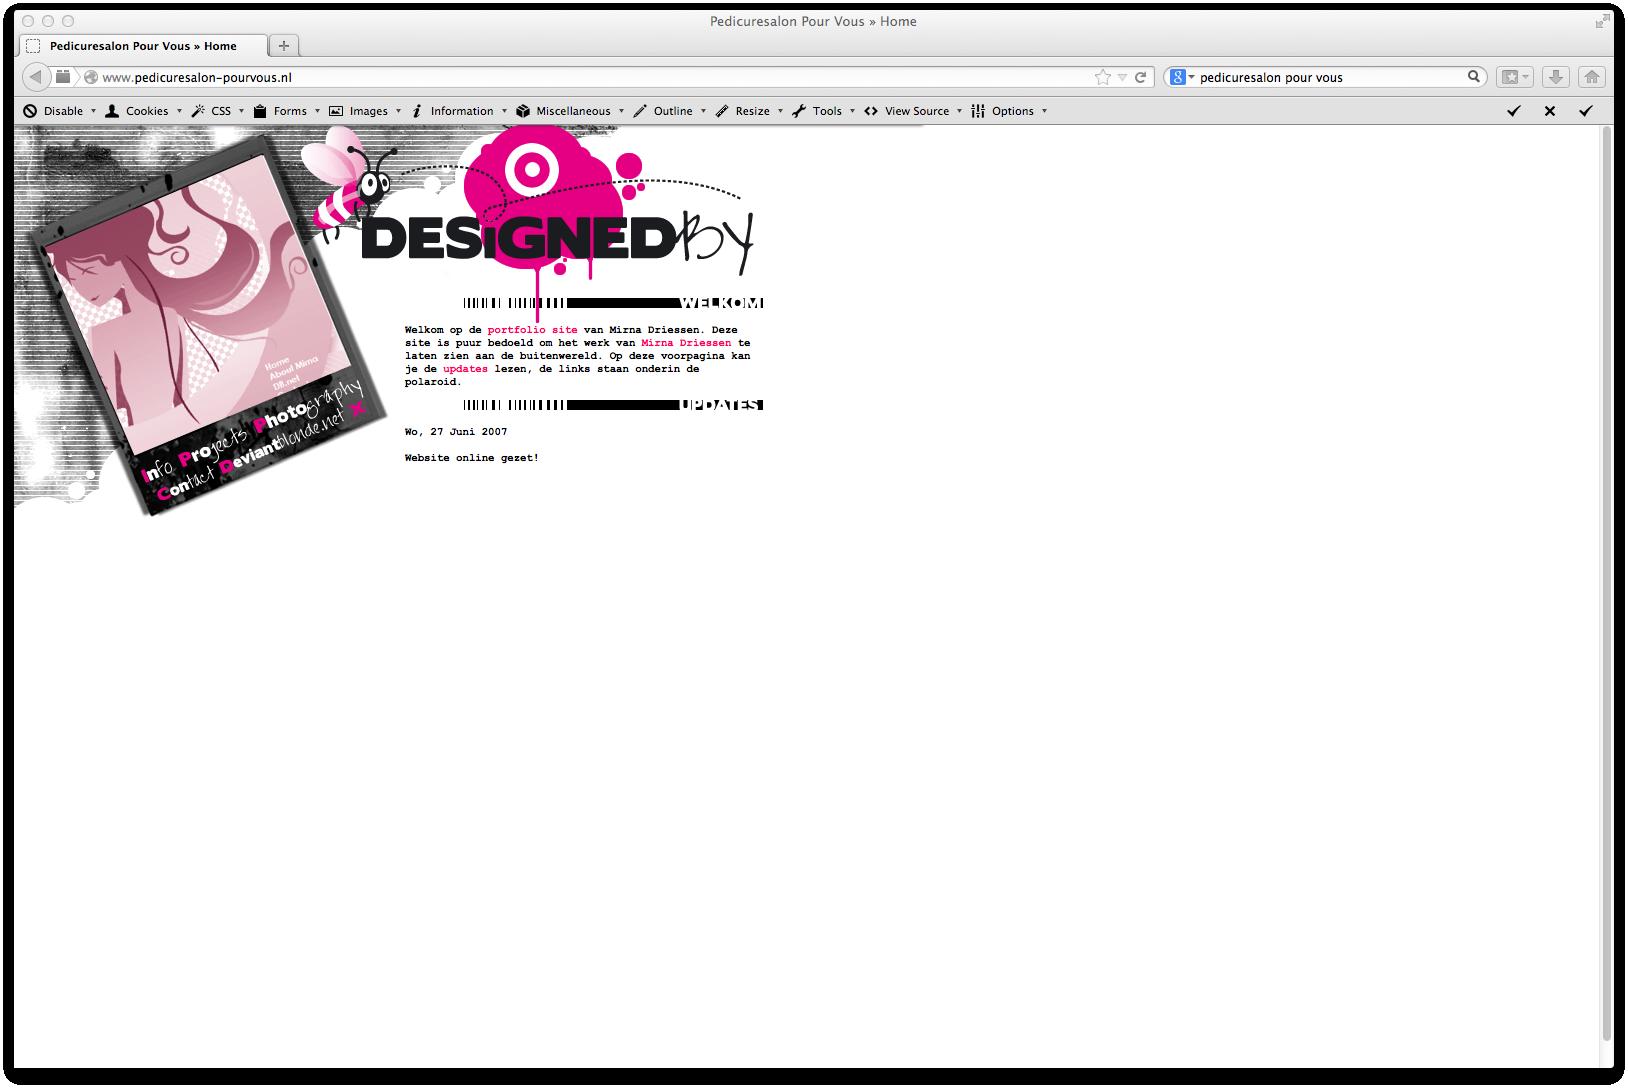 website-designedby-v1